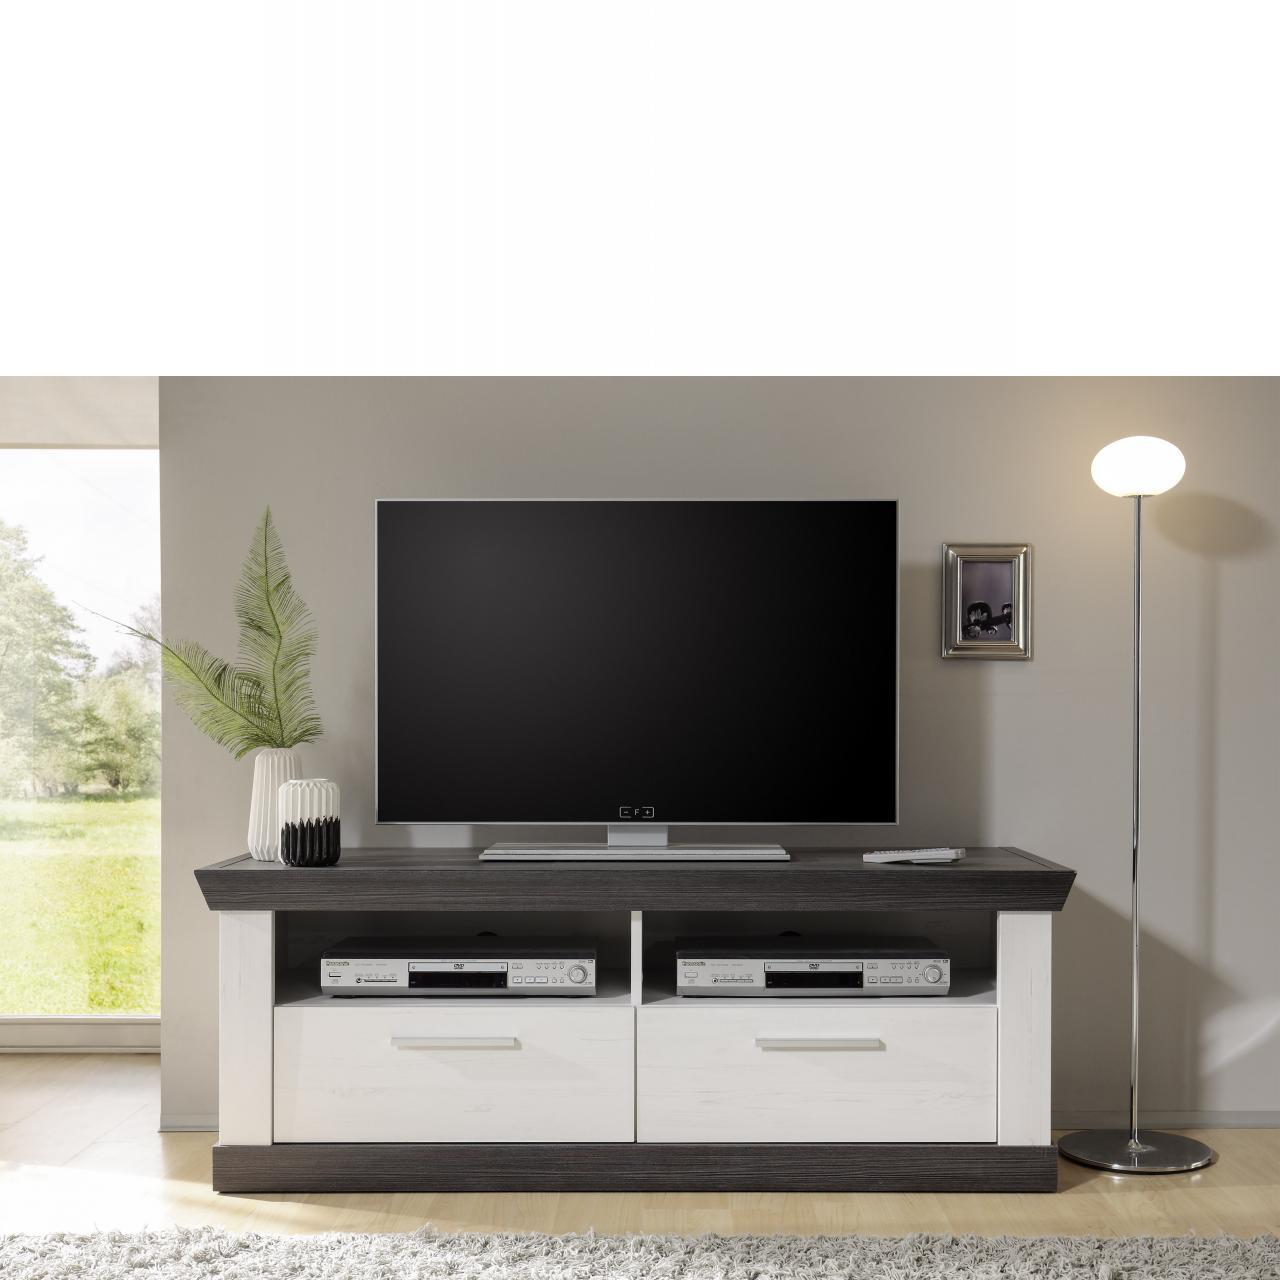 lowboard aus paulowniaholz landhausstil wei. Black Bedroom Furniture Sets. Home Design Ideas